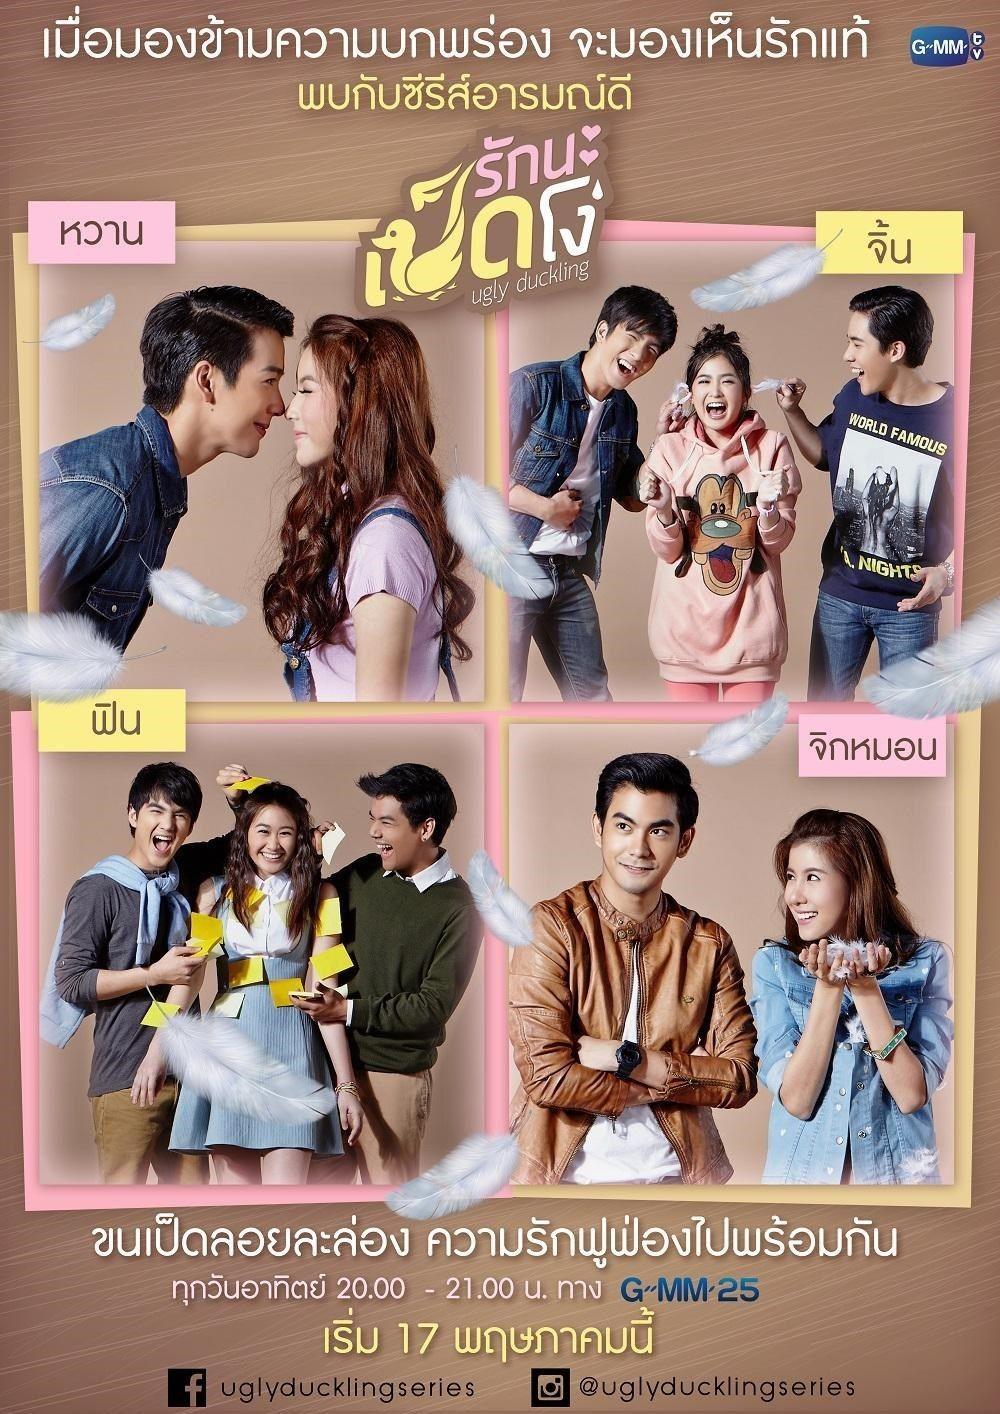 match com gratis thai girls